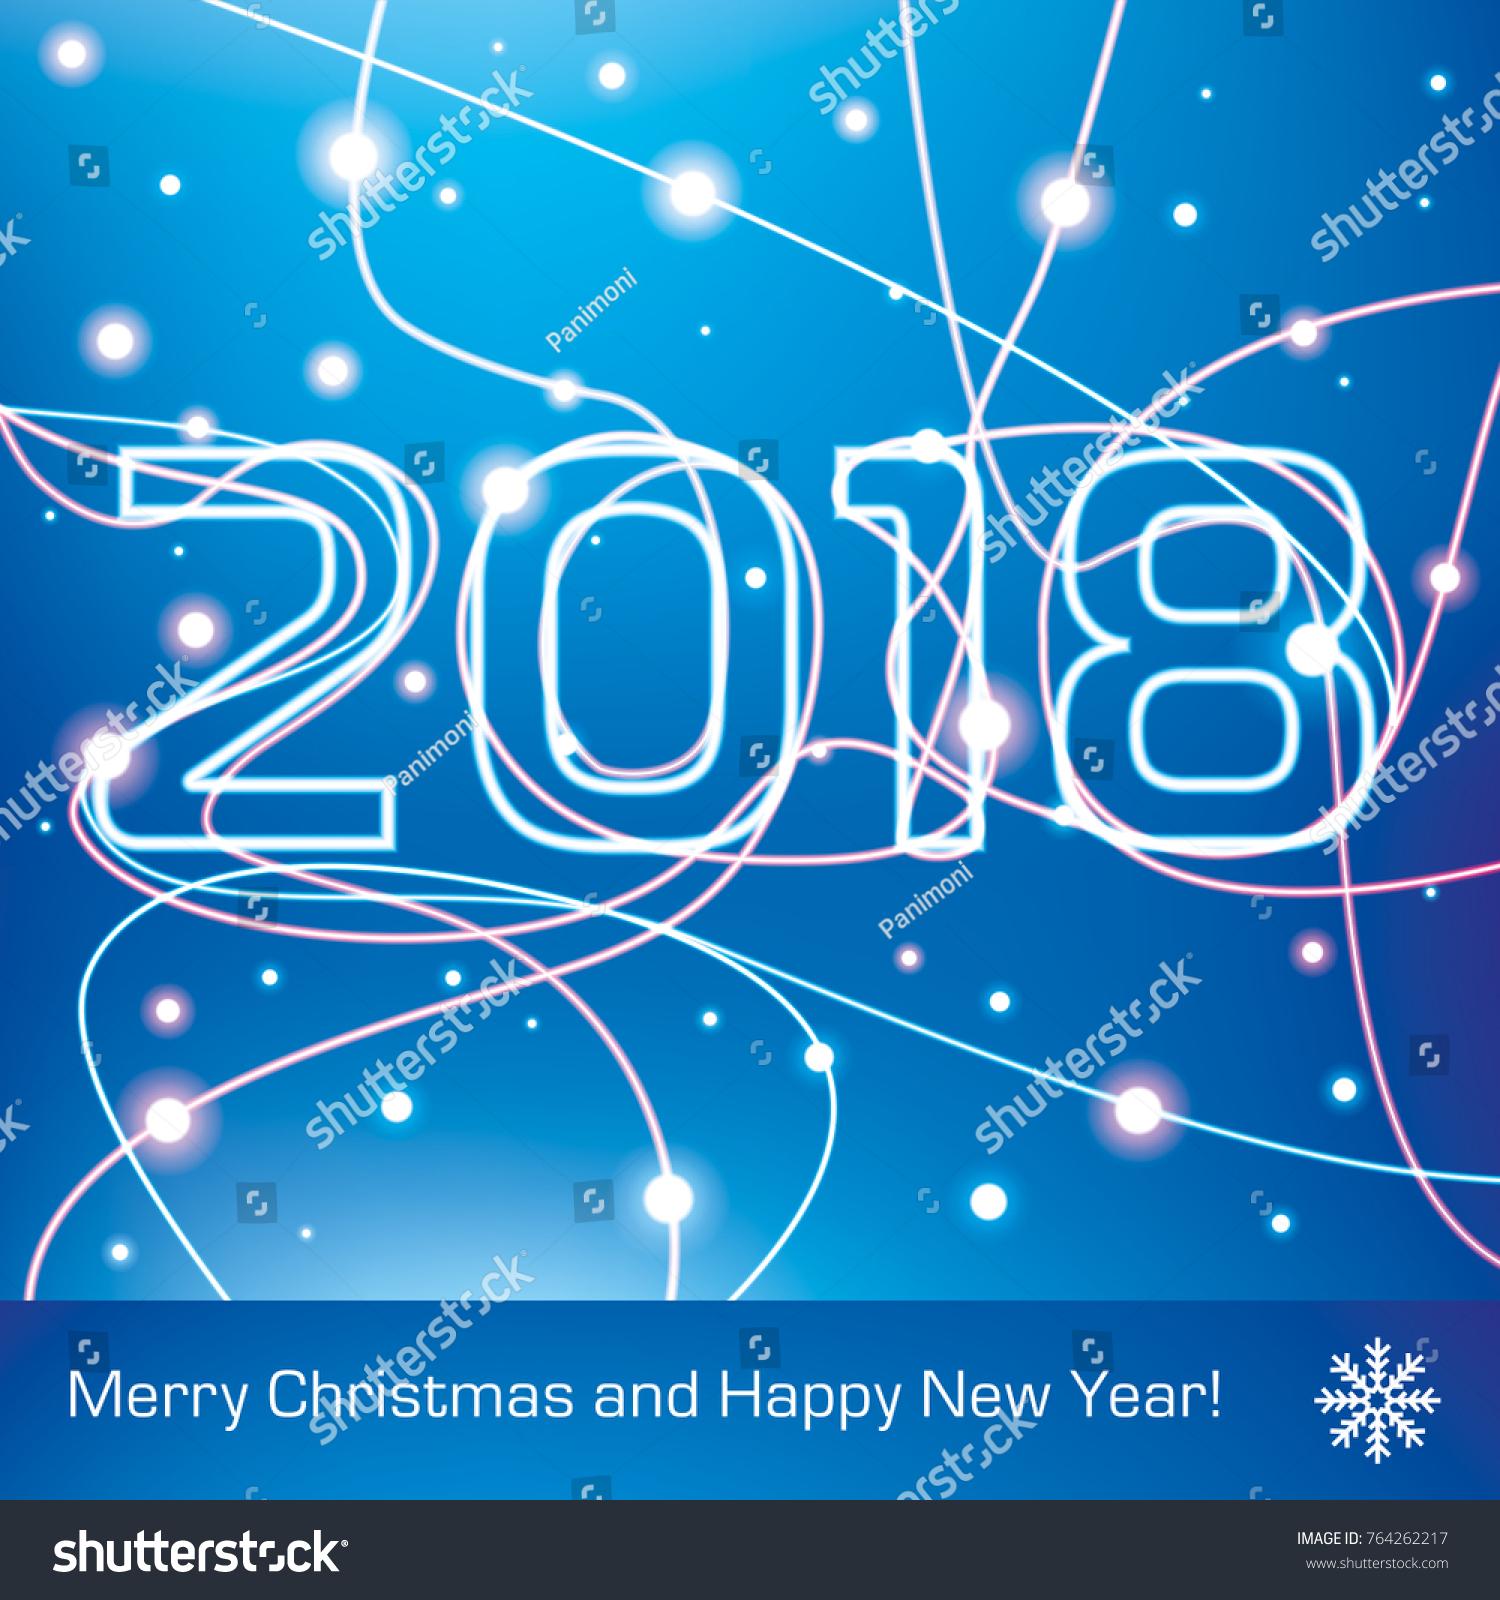 Merry Christmas Happy New Year 2018 Stock Vector 764262217 ...